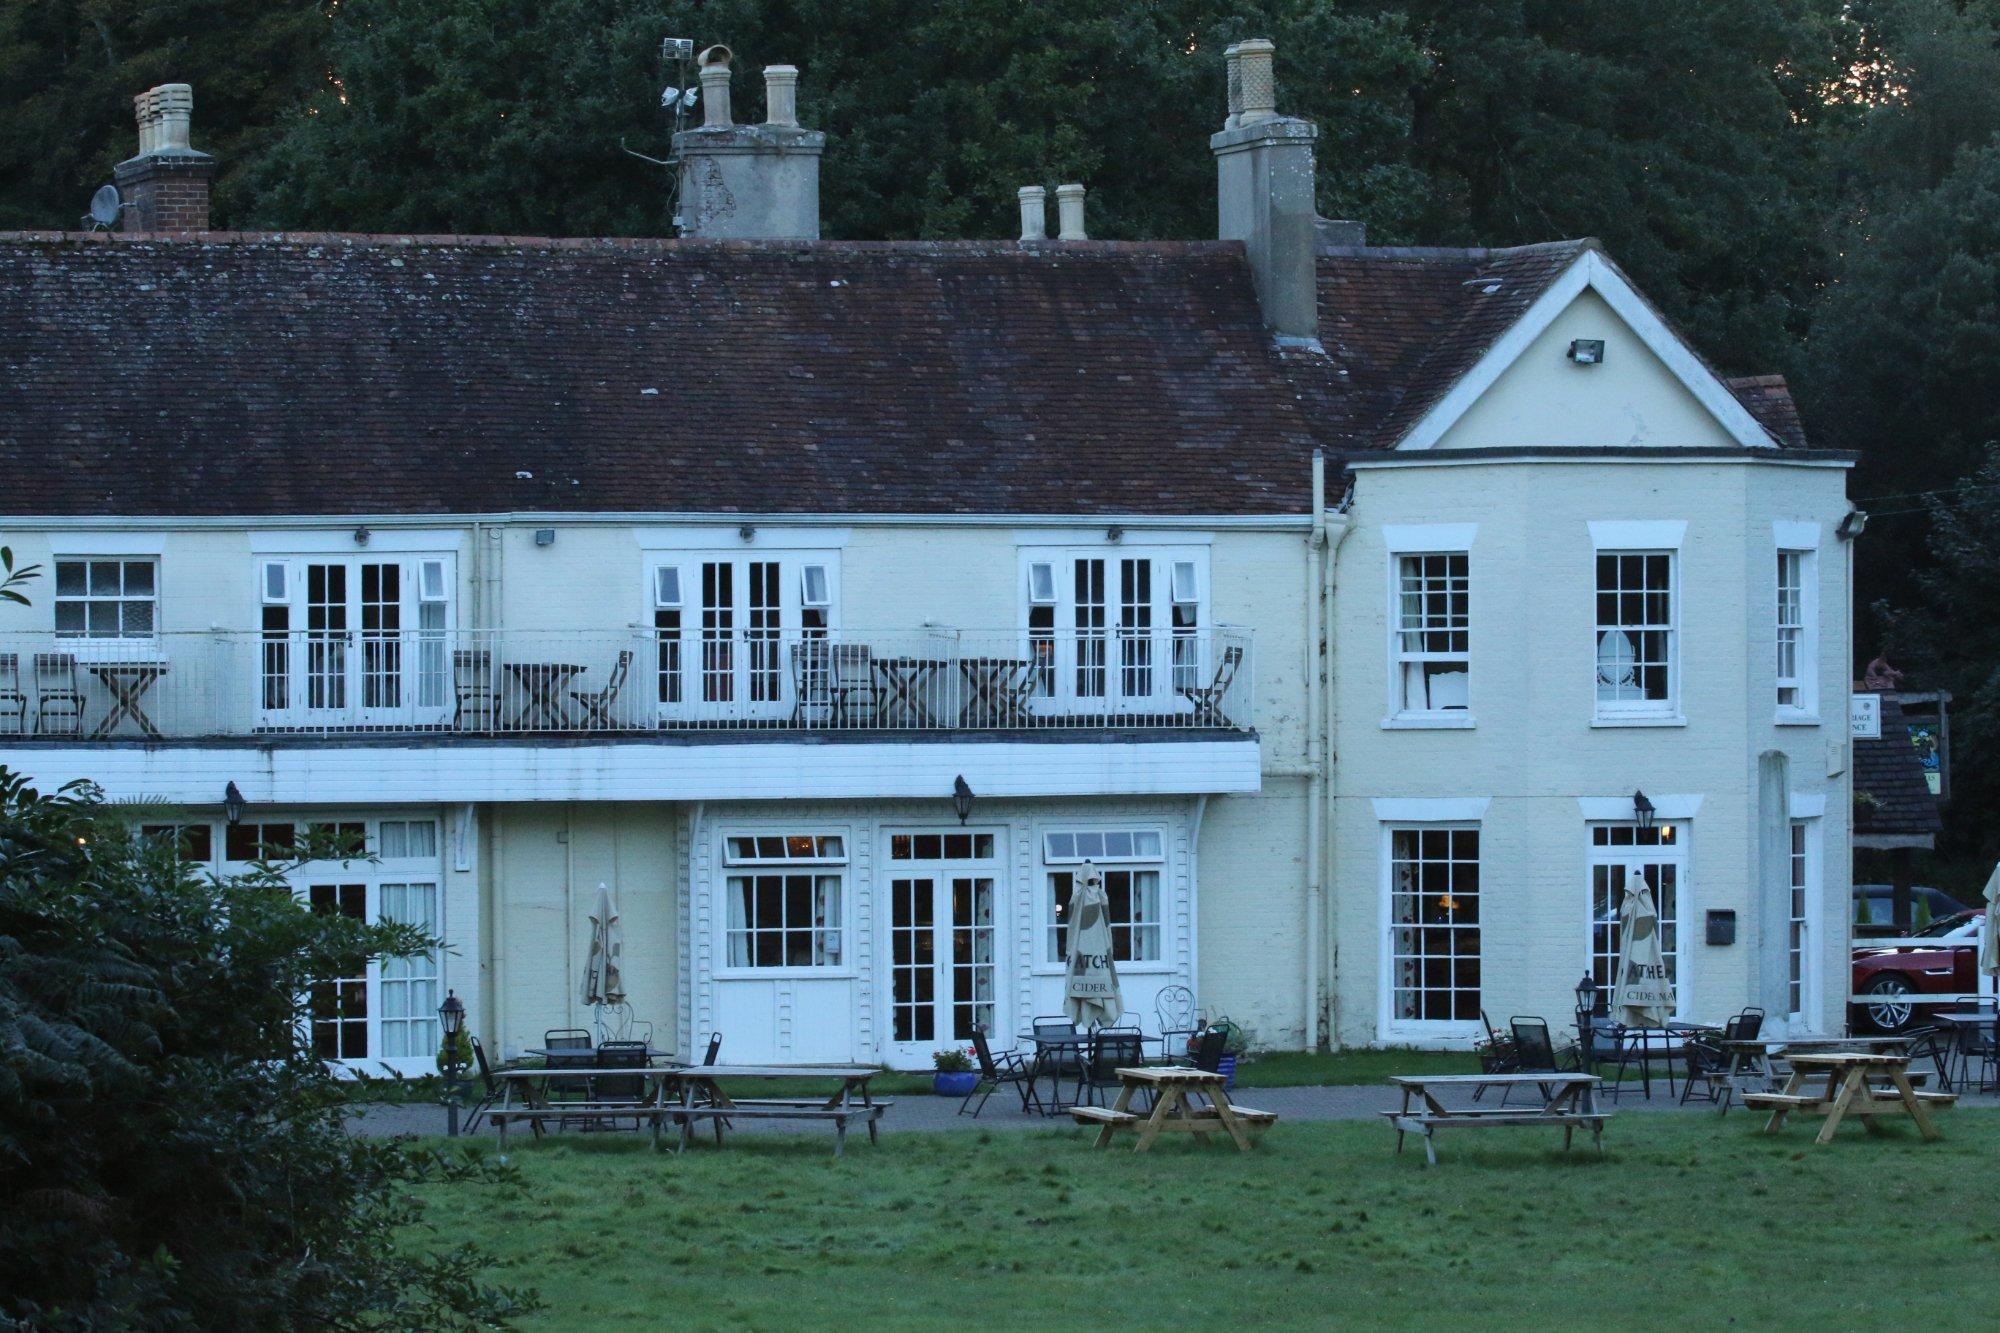 Tyrrells Ford Country Inn & Hotel